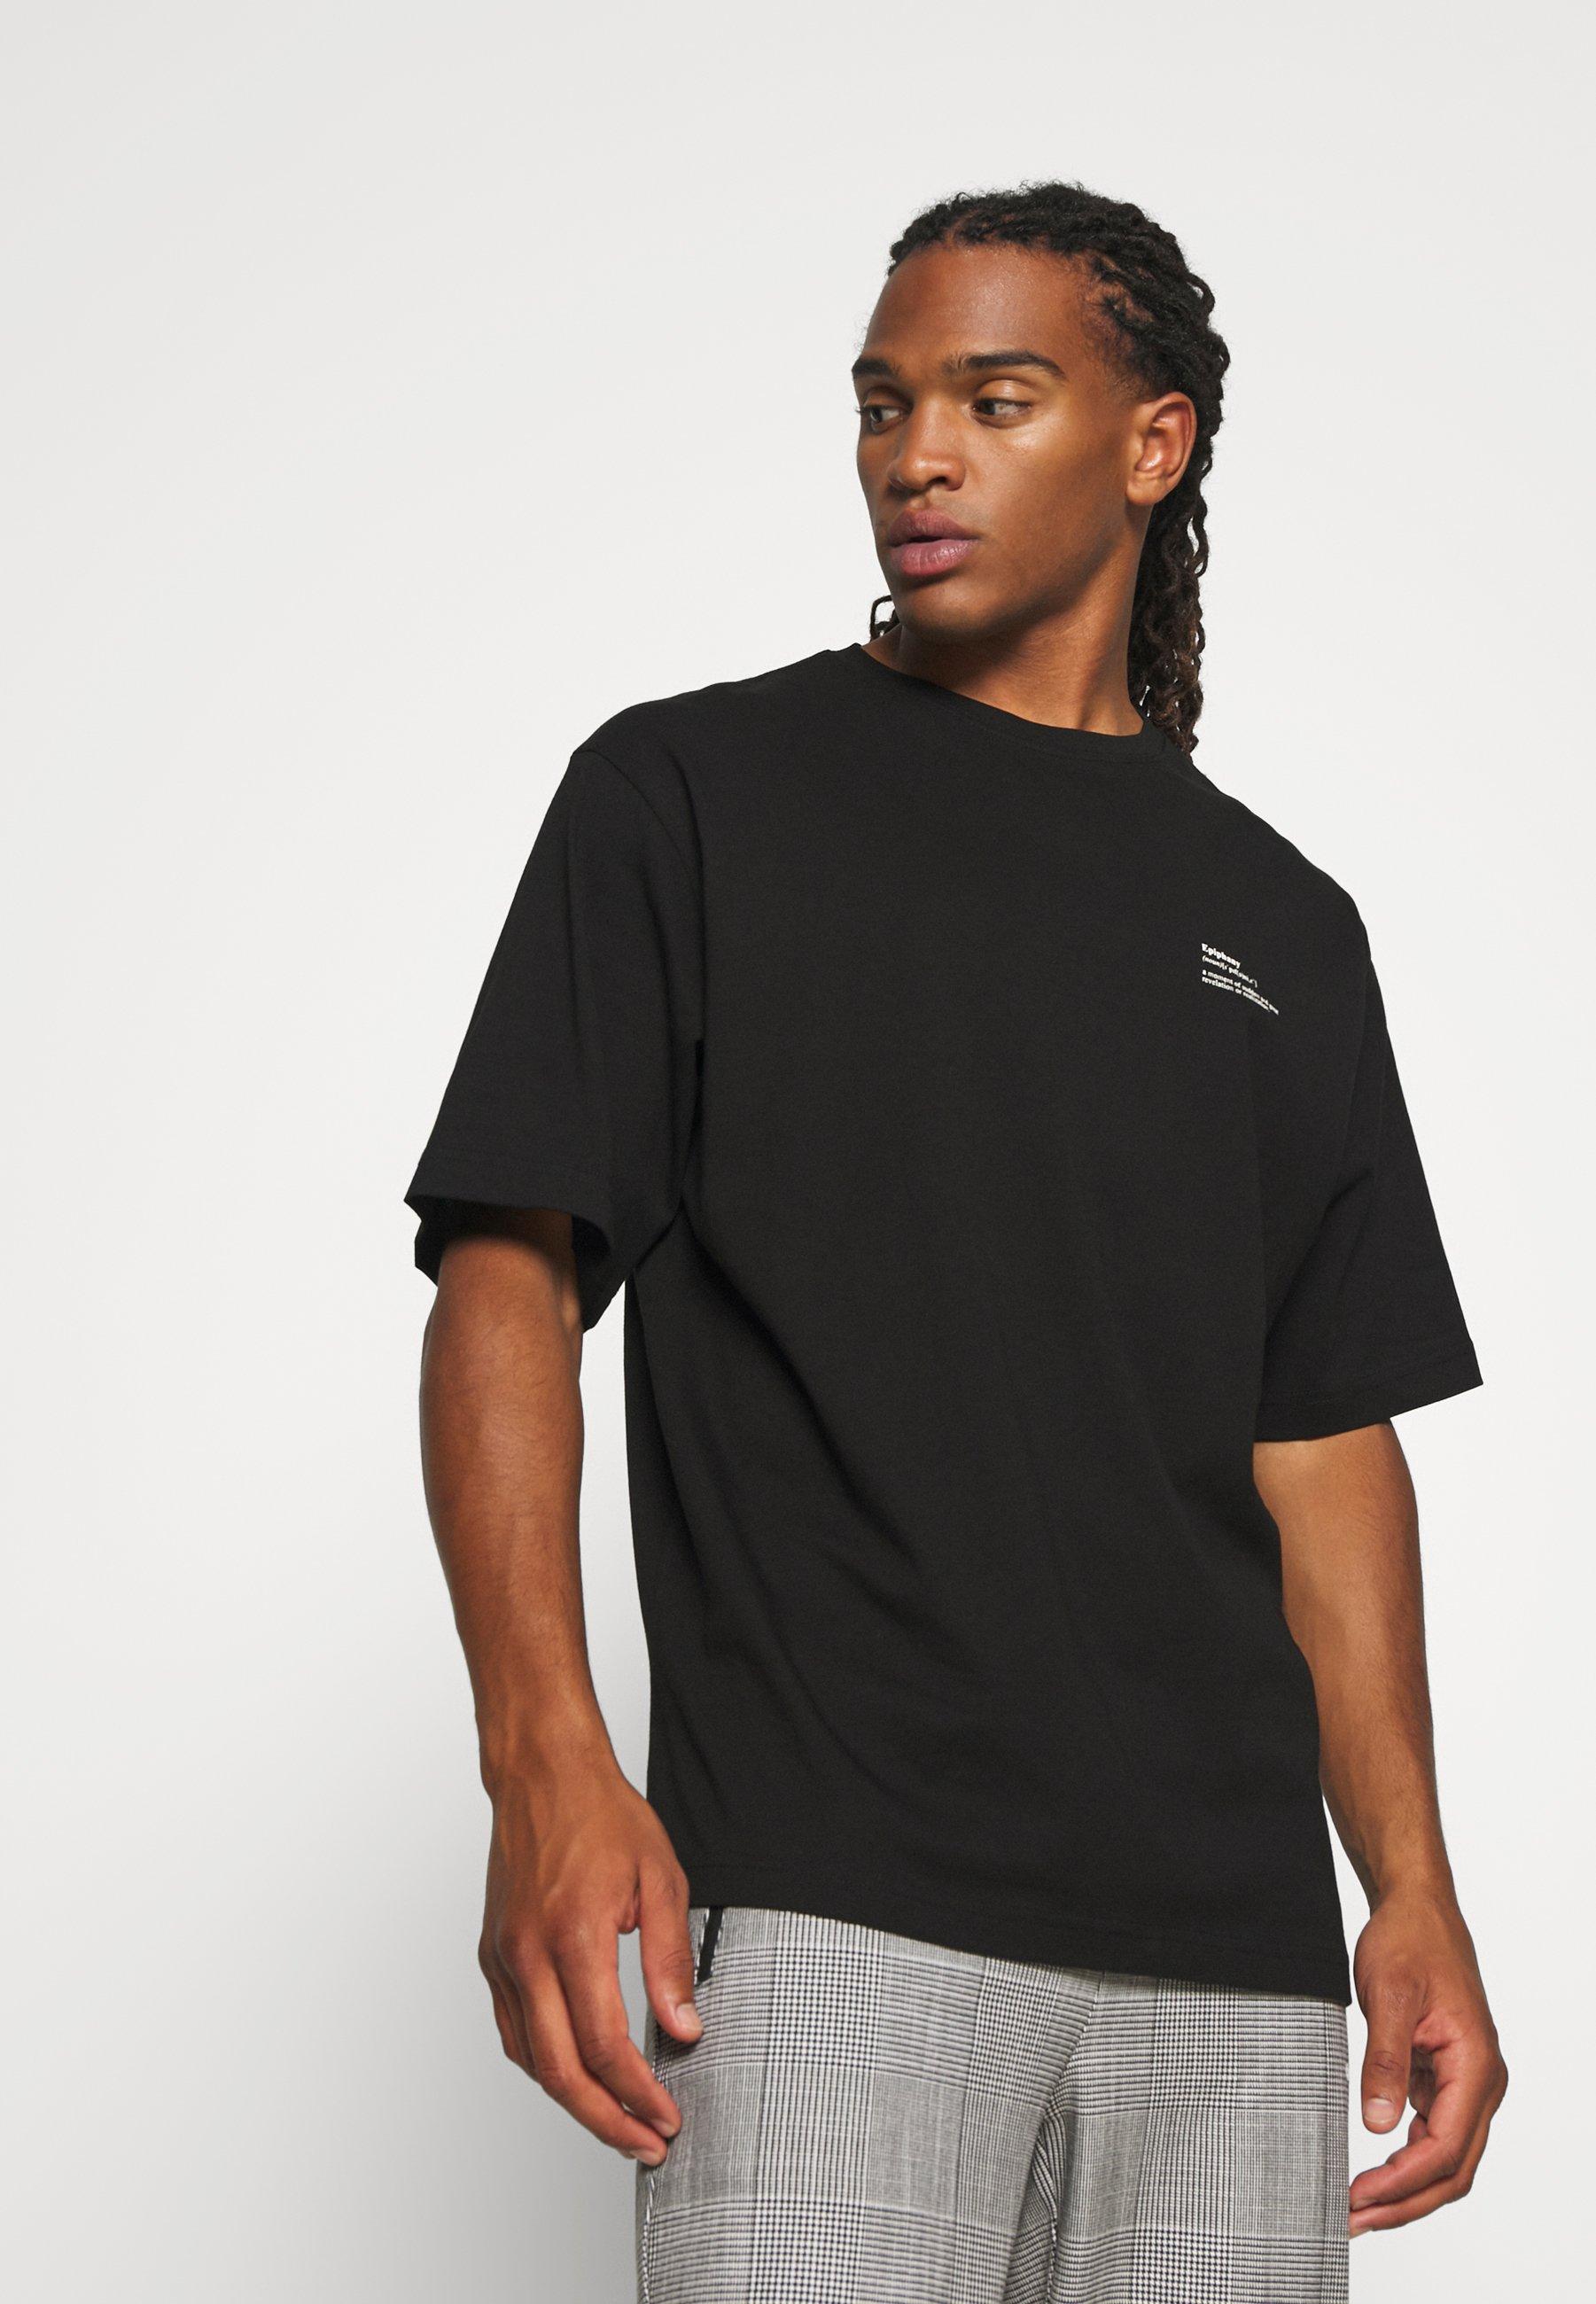 WRSTBHVR EPIPHANY - Camiseta estampada - black - Ropa de hombre